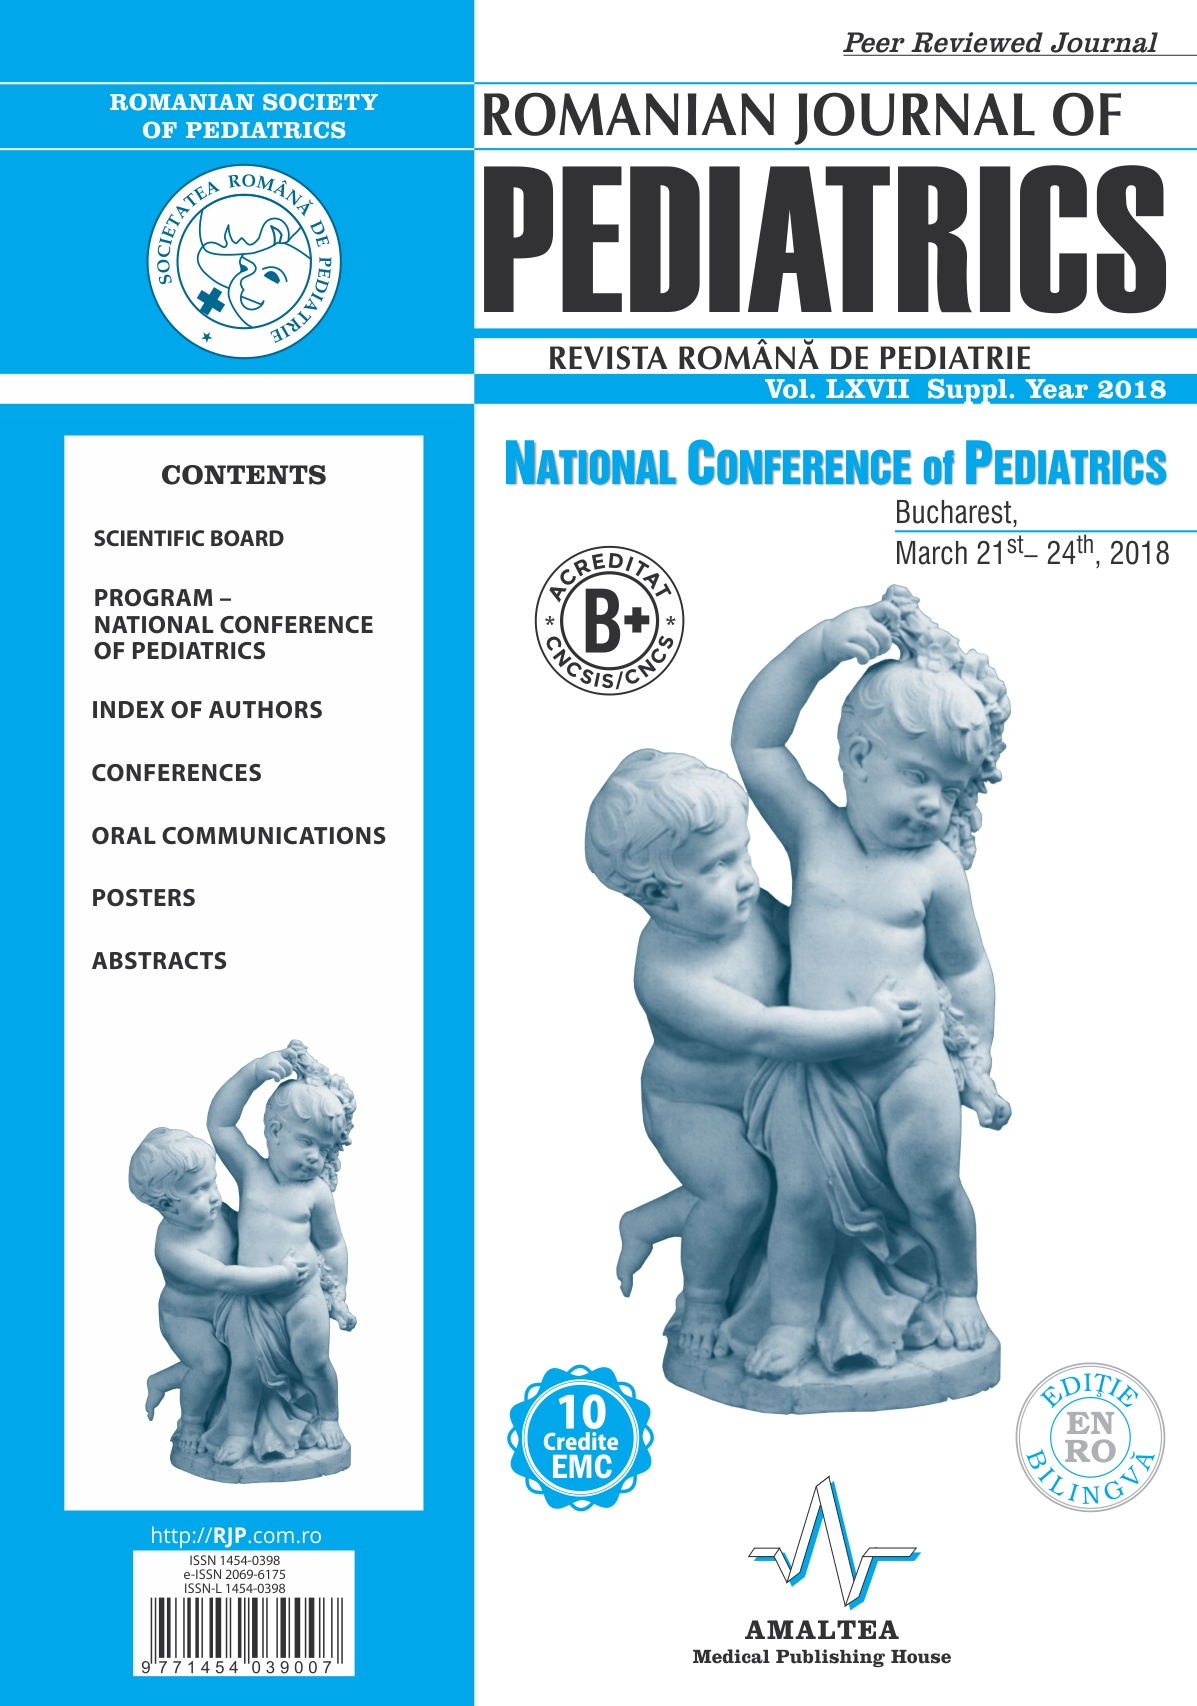 Romanian Journal of Pediatrics | Volume LXVII, Suppl., Year 2018